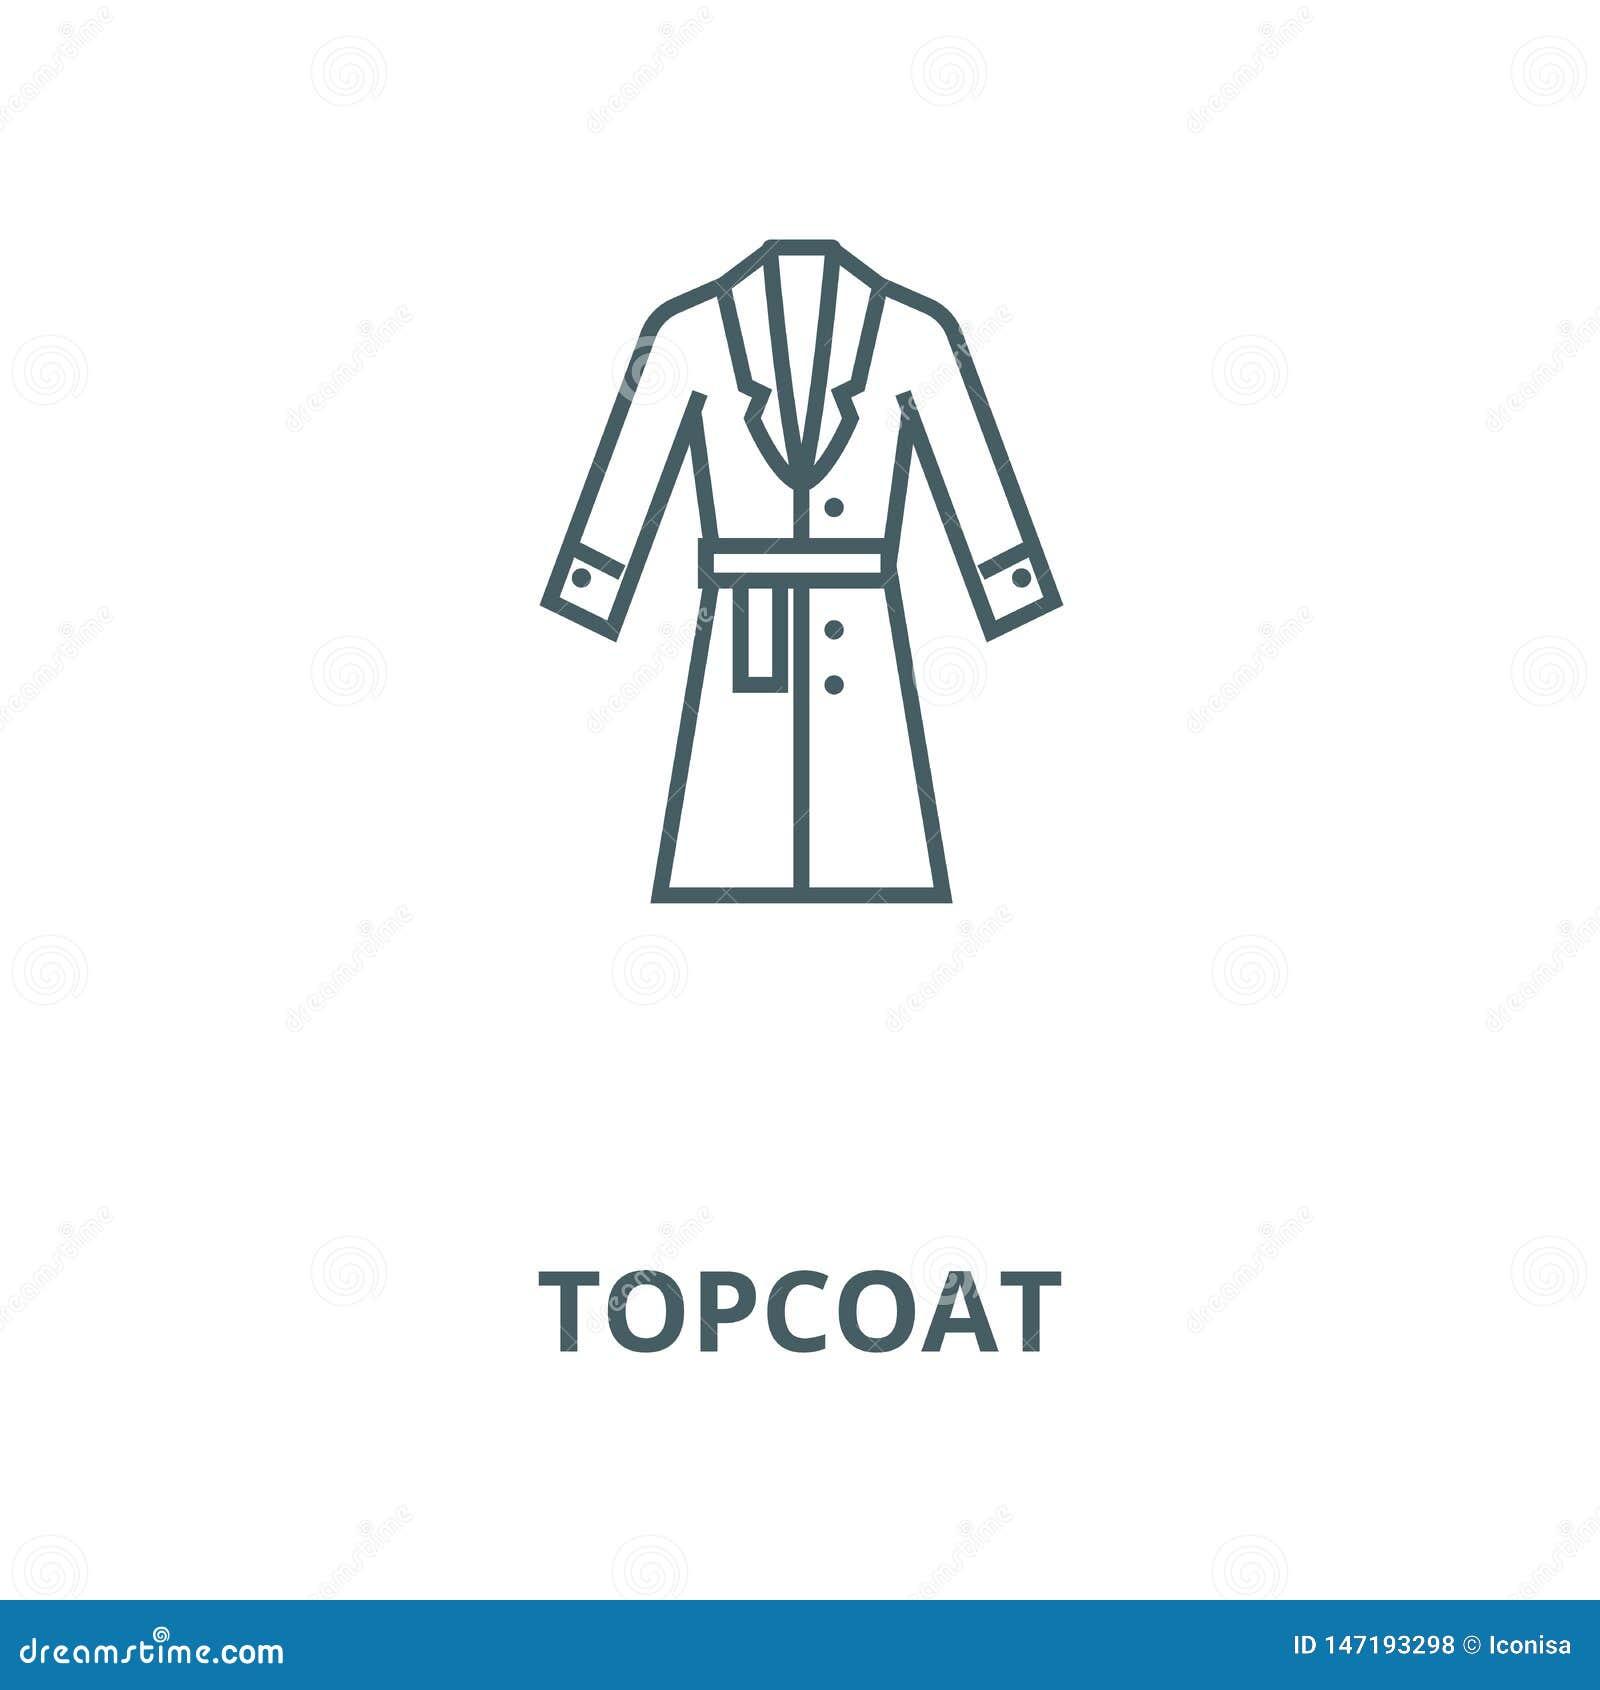 Topcoat, διανυσματικό εικονίδιο γραμμών χειμερινών παλτών, γραμμική έννοια, σημάδι περιλήψεων, σύμβολο